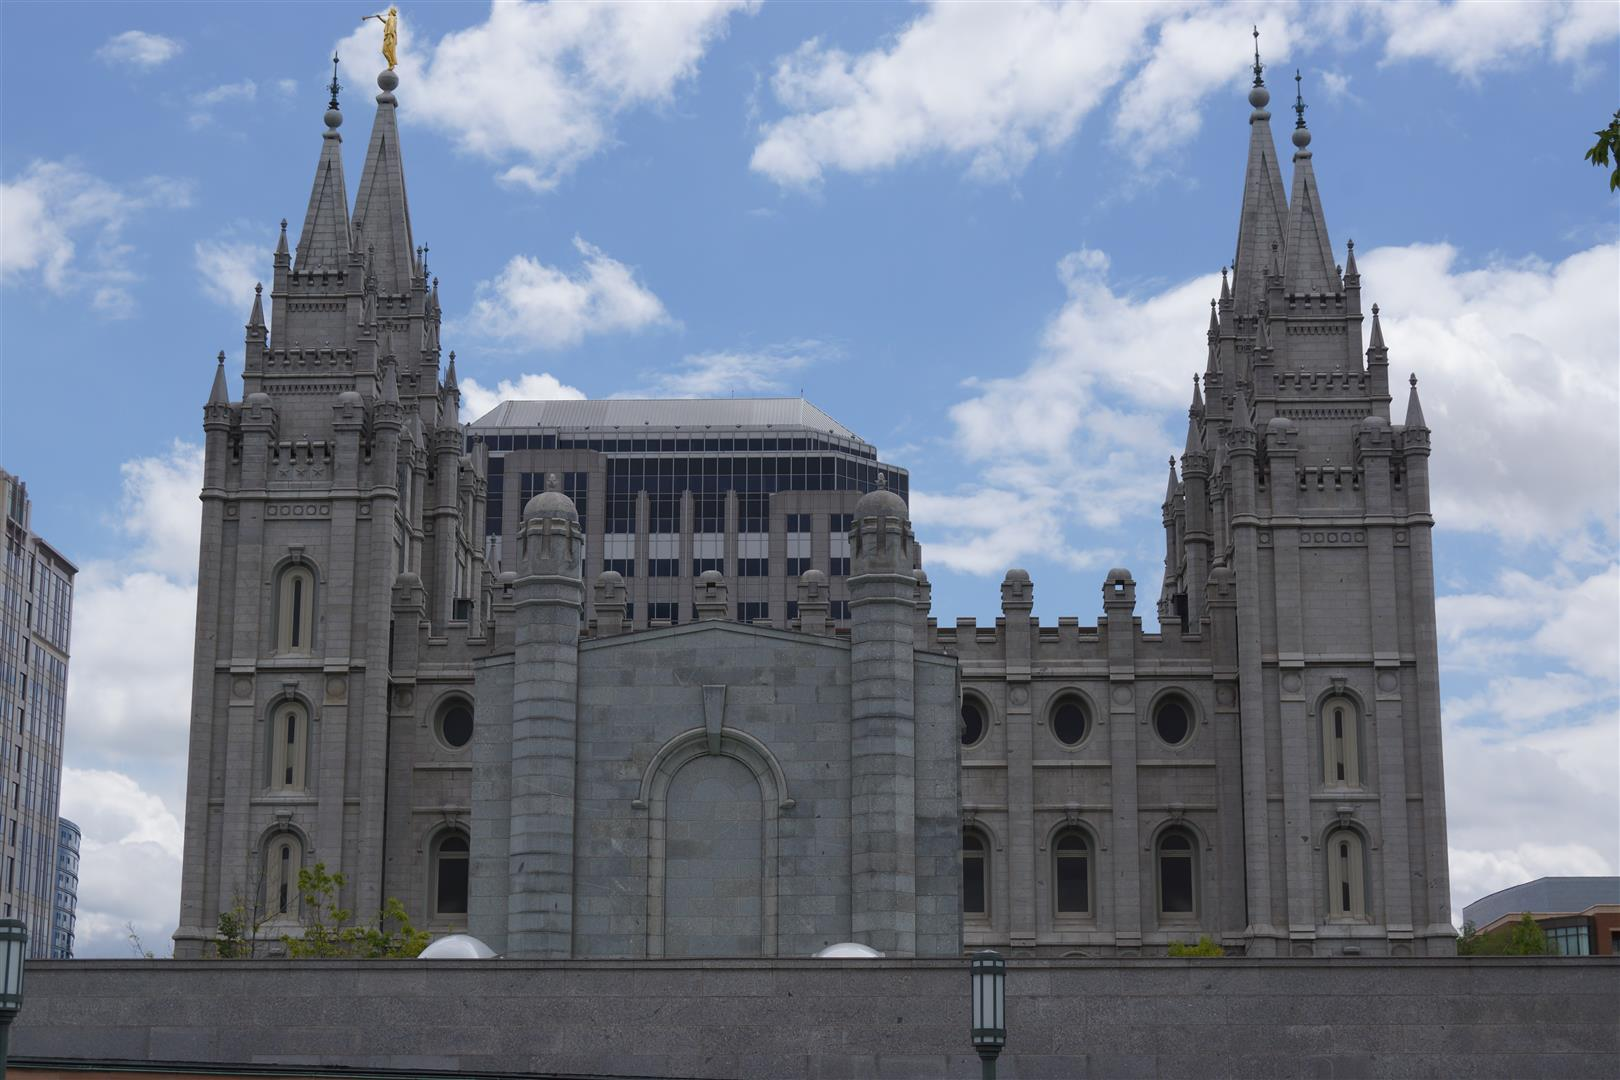 Der Tempel im Profil.